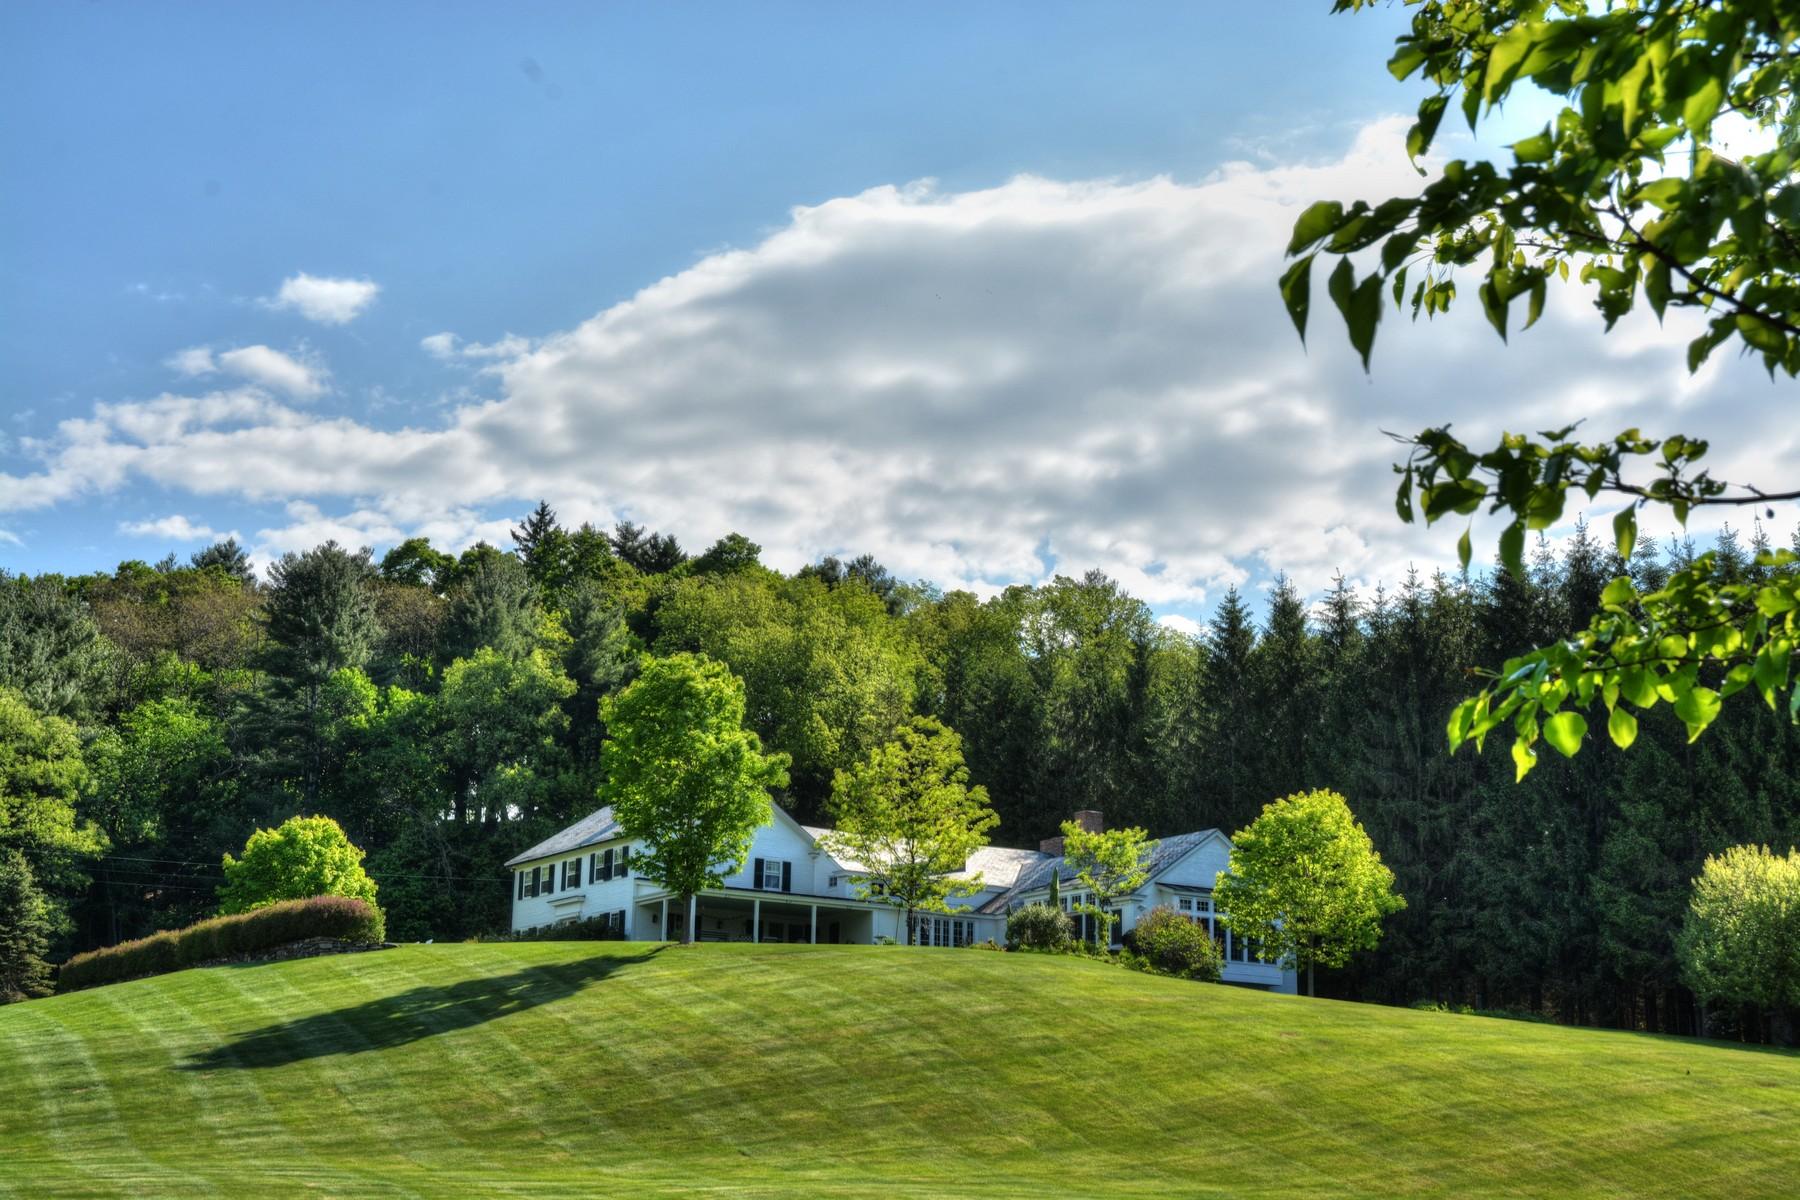 Casa Unifamiliar por un Venta en 2330 River Road, Manchester 2330 River Rd Manchester, Vermont 05255 Estados Unidos